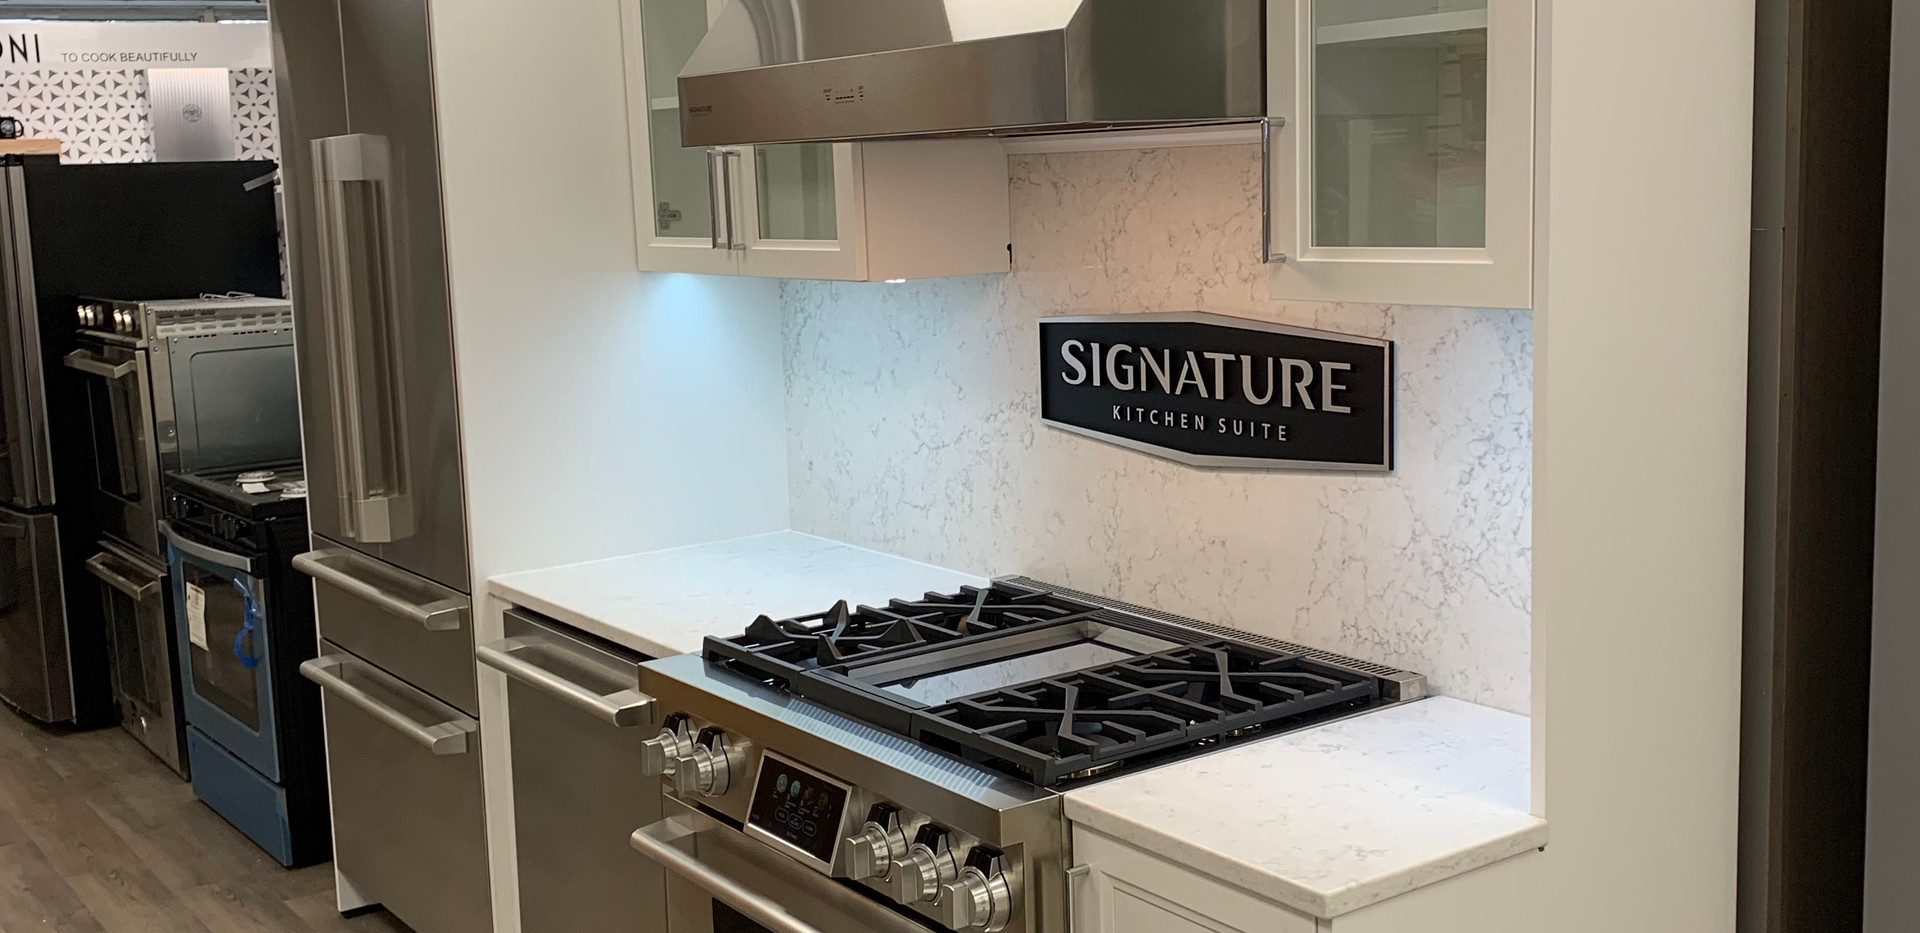 Signature Appliance